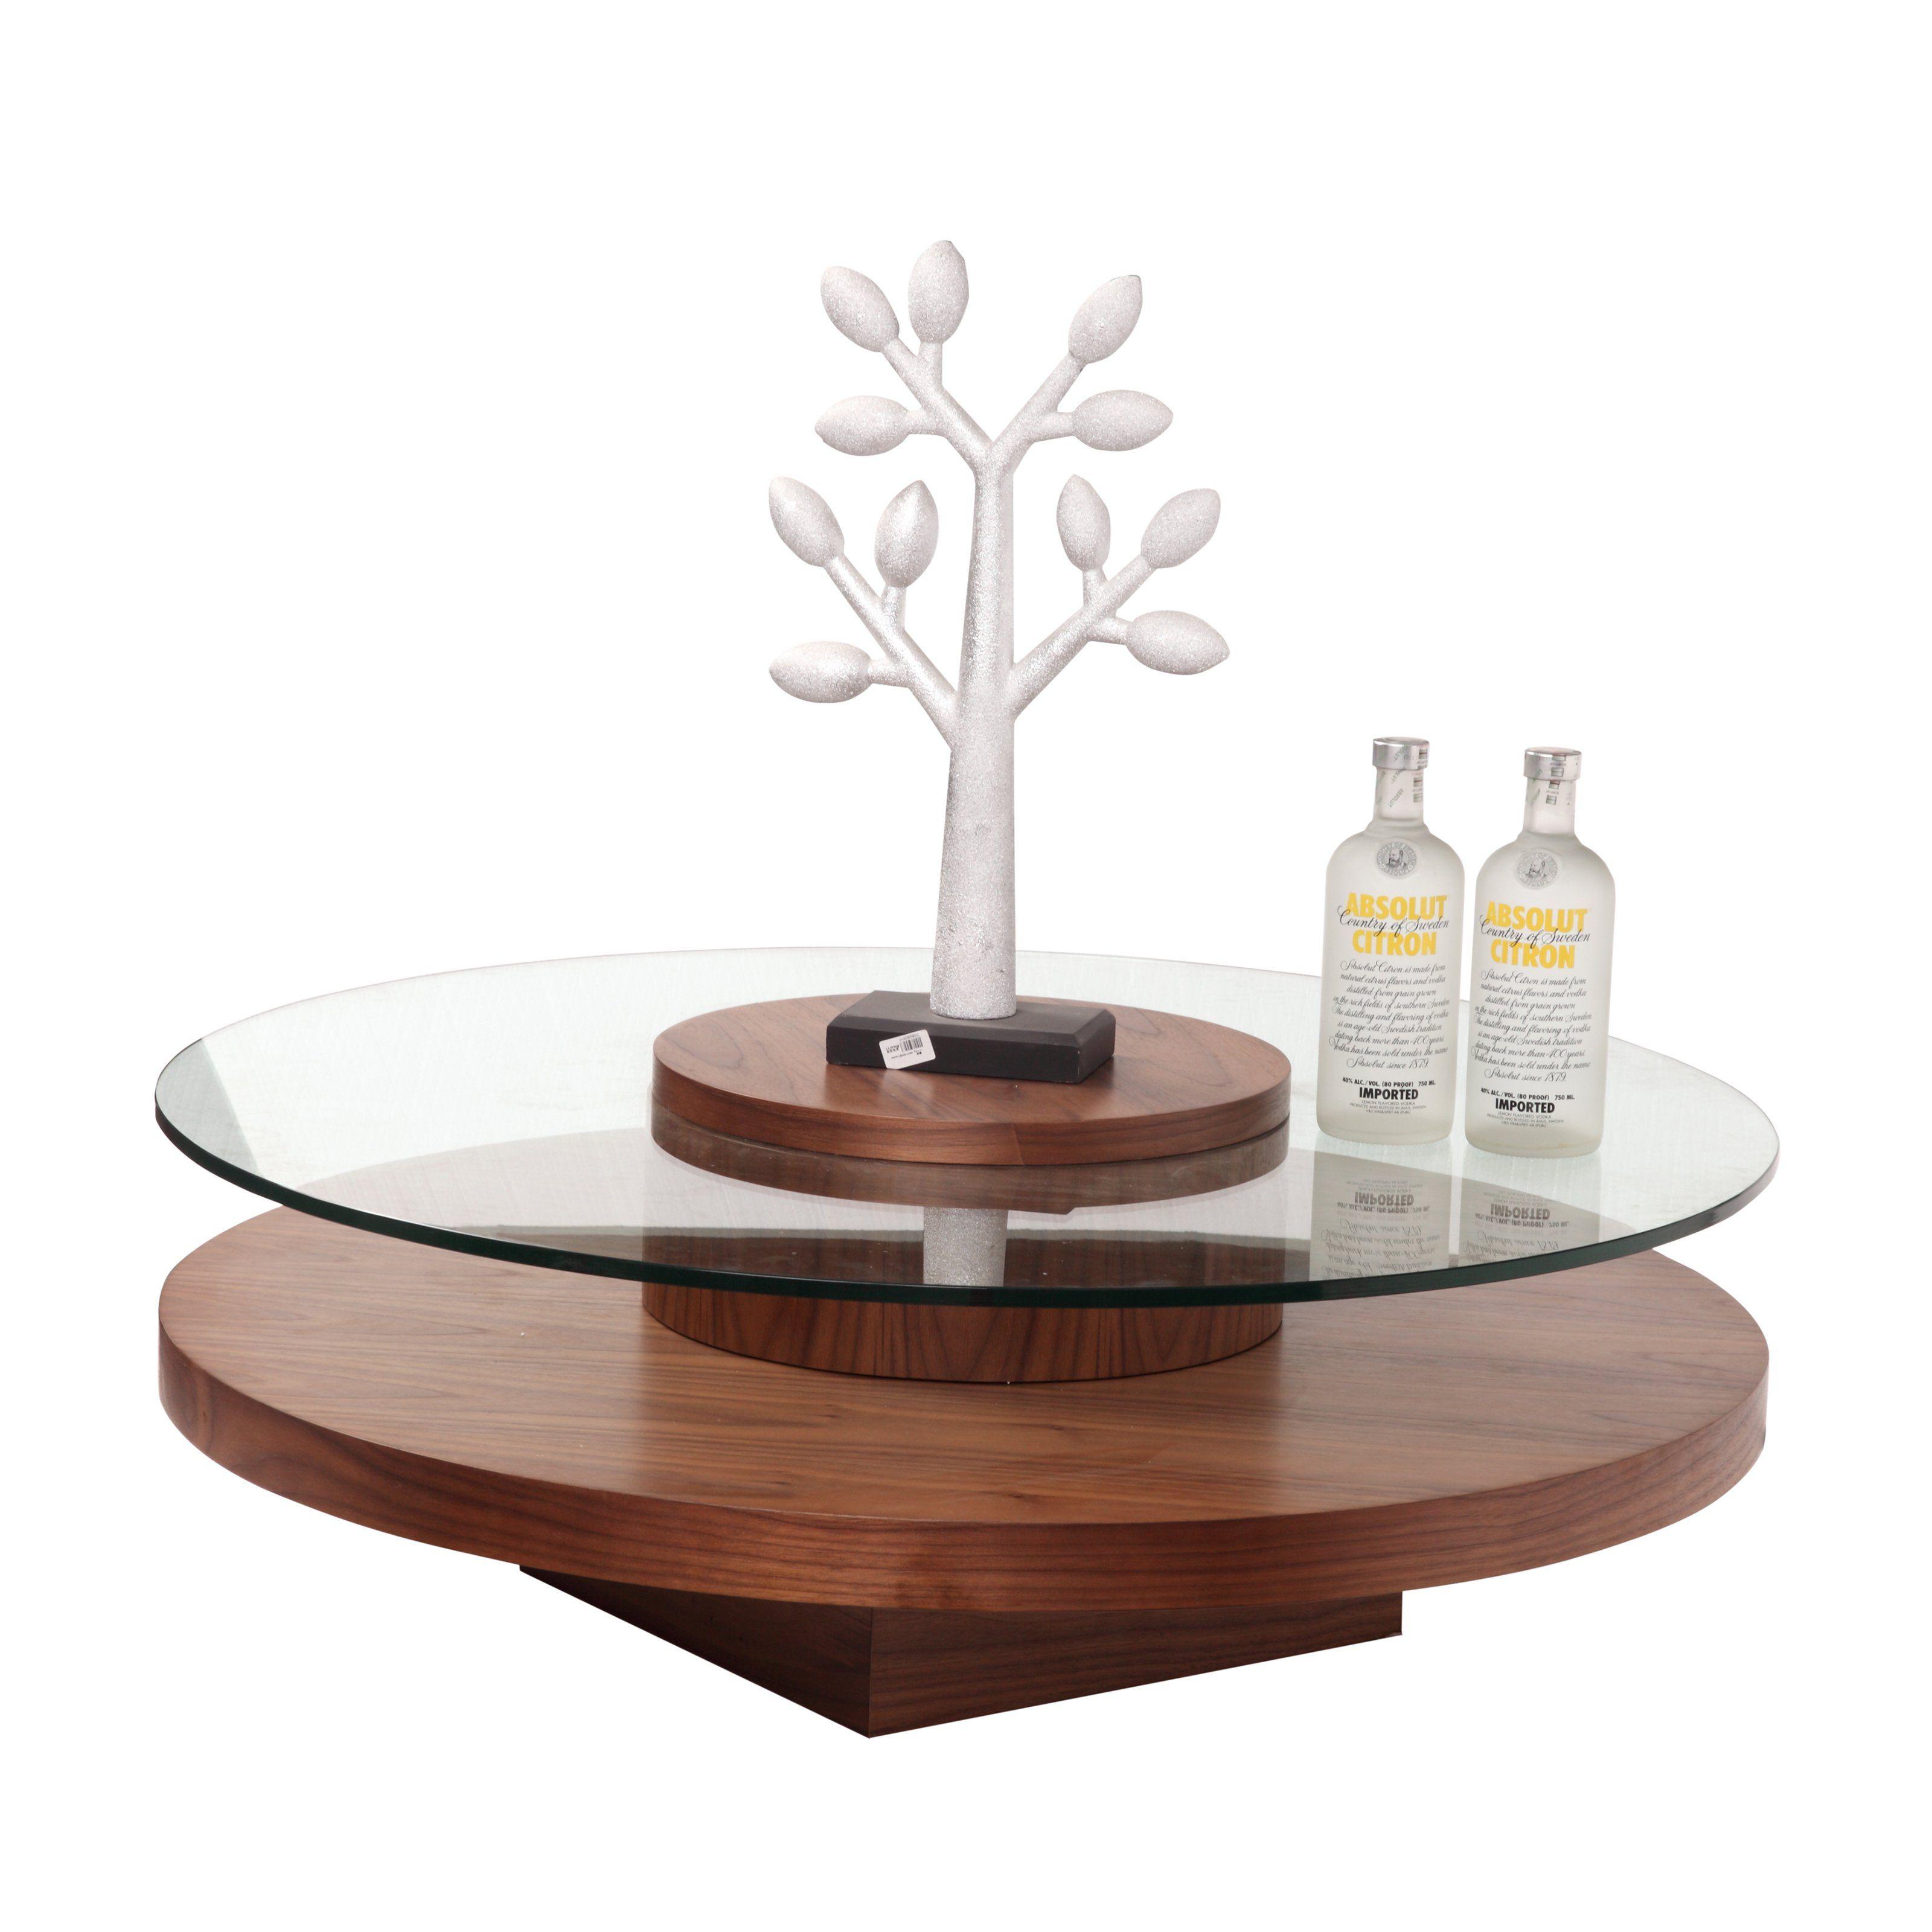 Revere Circle Coffee Table Warm Walnut Www Hayneedle Com Circle Coffee Tables Coffee Table Round Coffee Table [ 3200 x 3200 Pixel ]